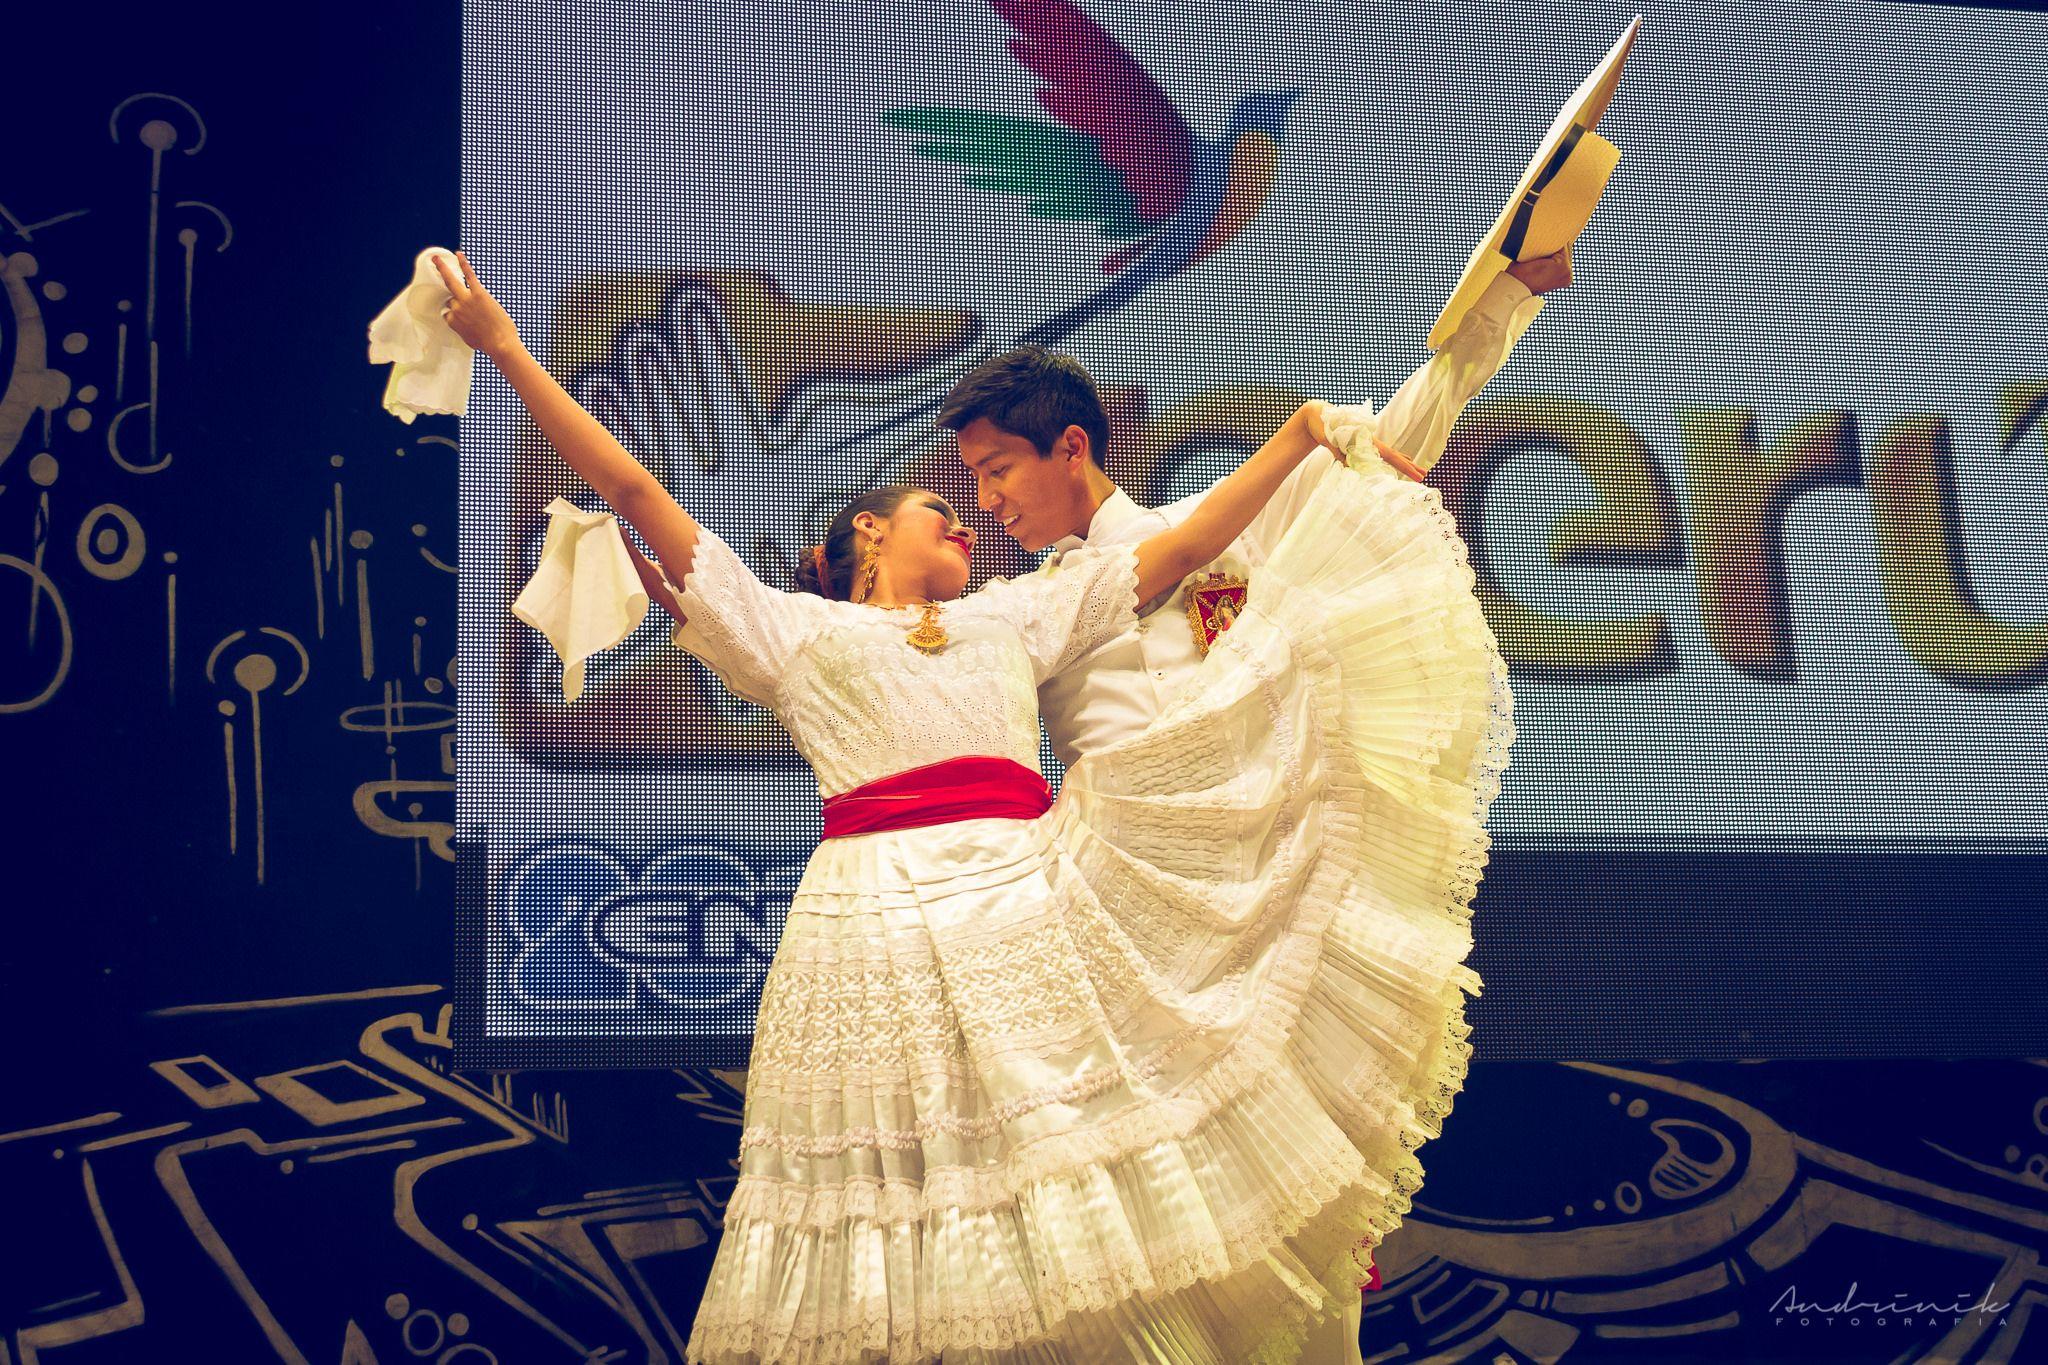 https://flic.kr/p/A6xr1Y | Argentina | ENIF 2015 | 29º Encuentro Nacional e Internacional de Folclore - San Miguel de Tucumán, Argentina. #ENIF2015